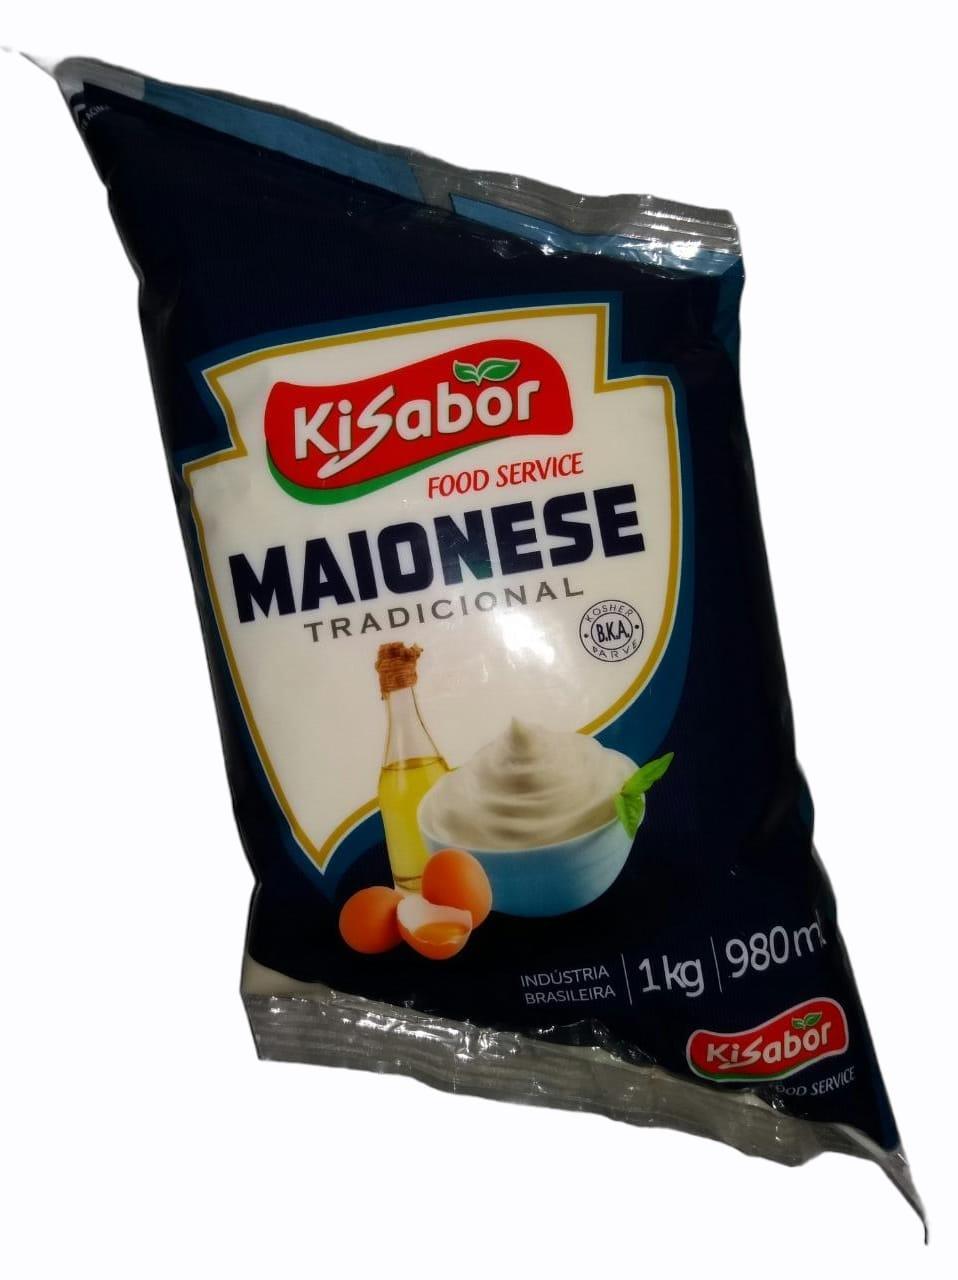 MAIONESE TRADICIONAL KISABOR 1 KG (11437)  - Chef Distribuidora